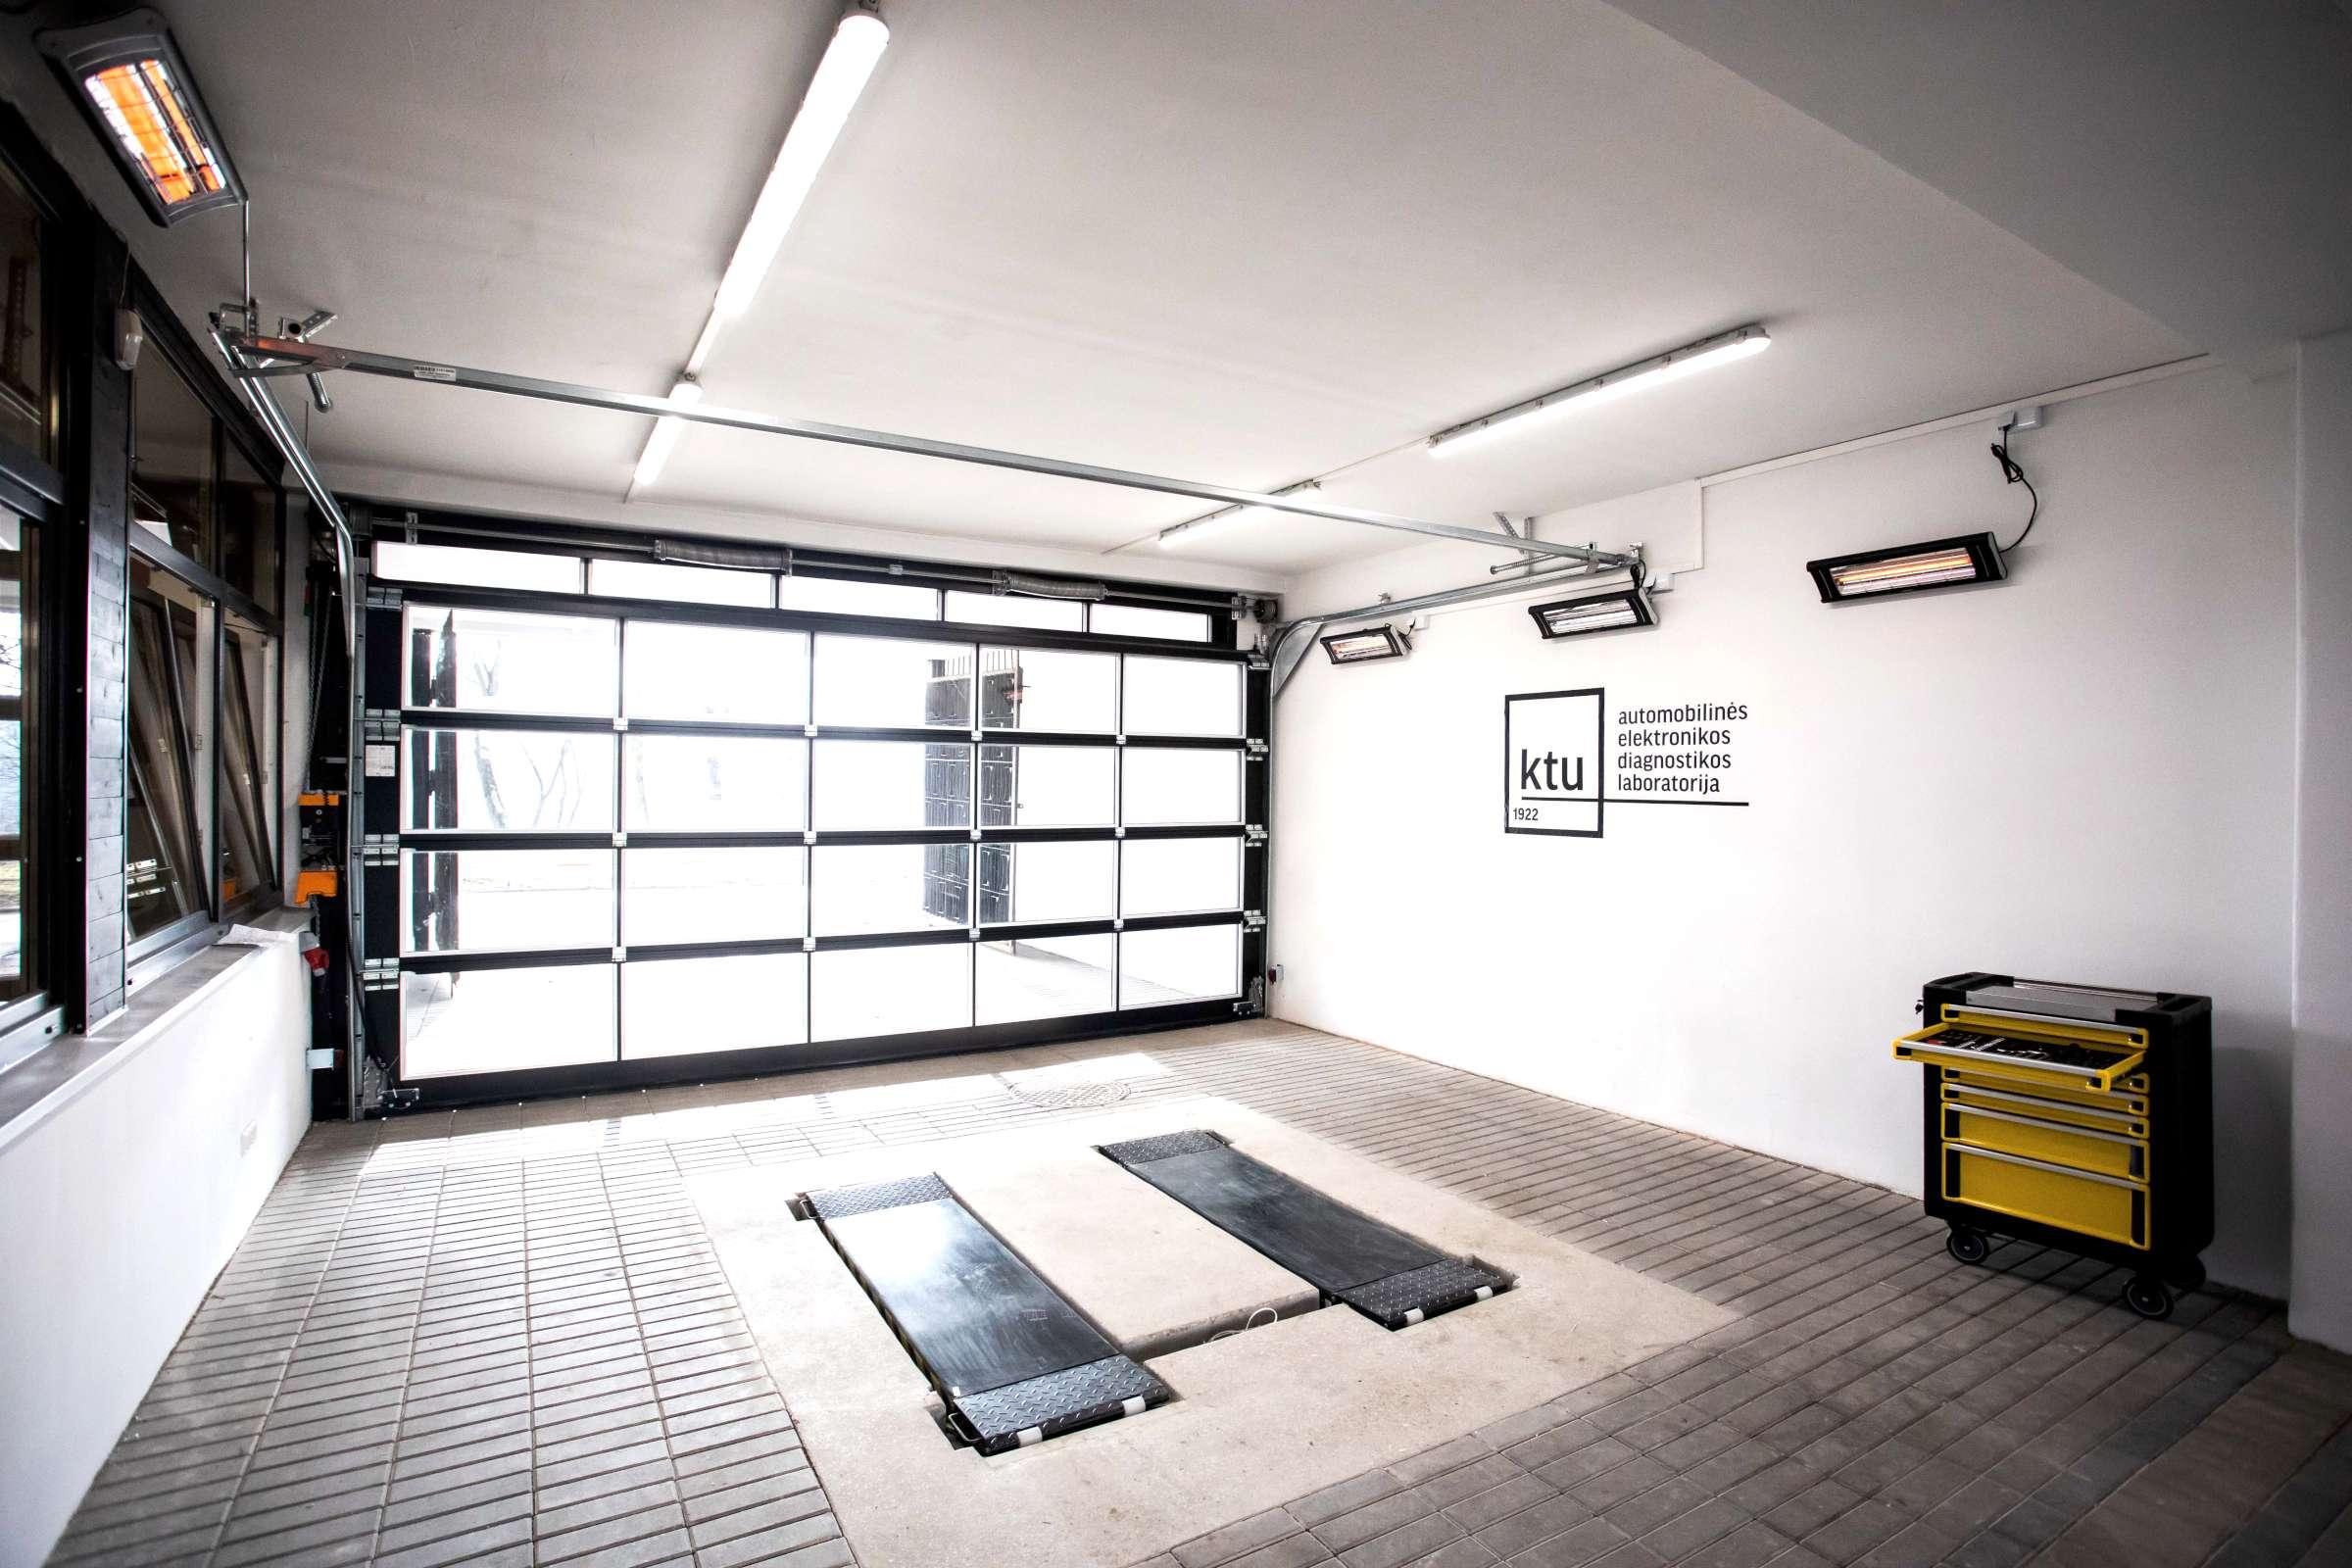 BalticDiag automobilinės elektronikos diagnostikos laboratorijos garažas-2400